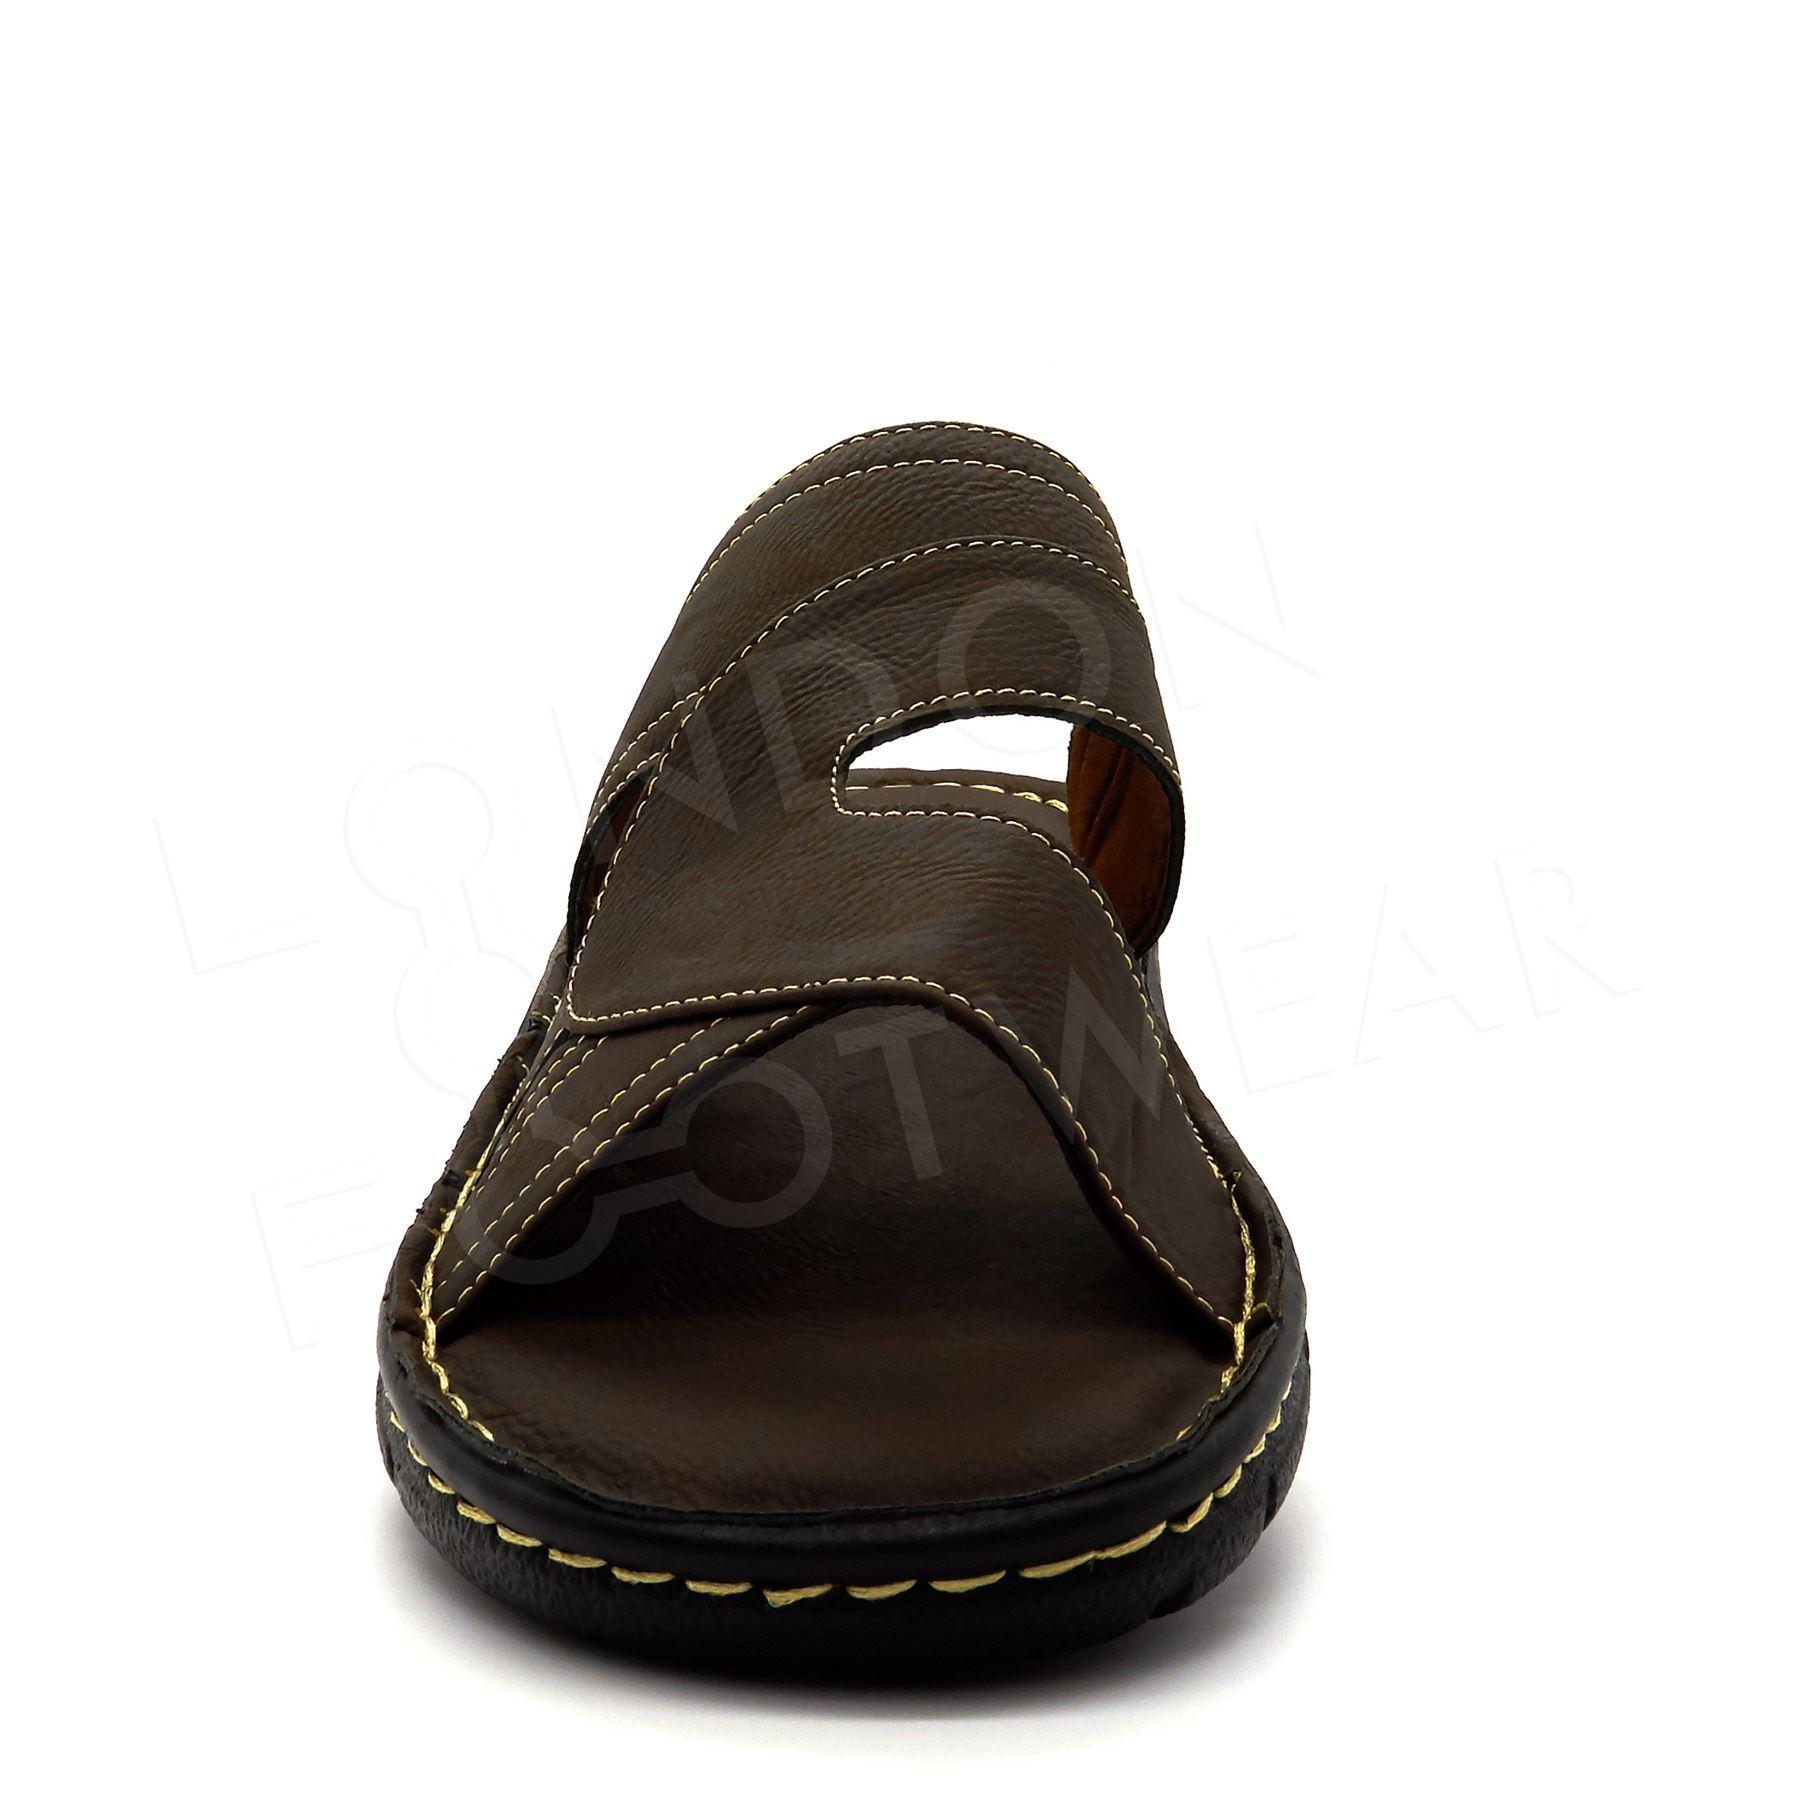 Mens Summer Comfort Walking Sandals Slip On Beach Mules Flip Flops Shoes 6-11